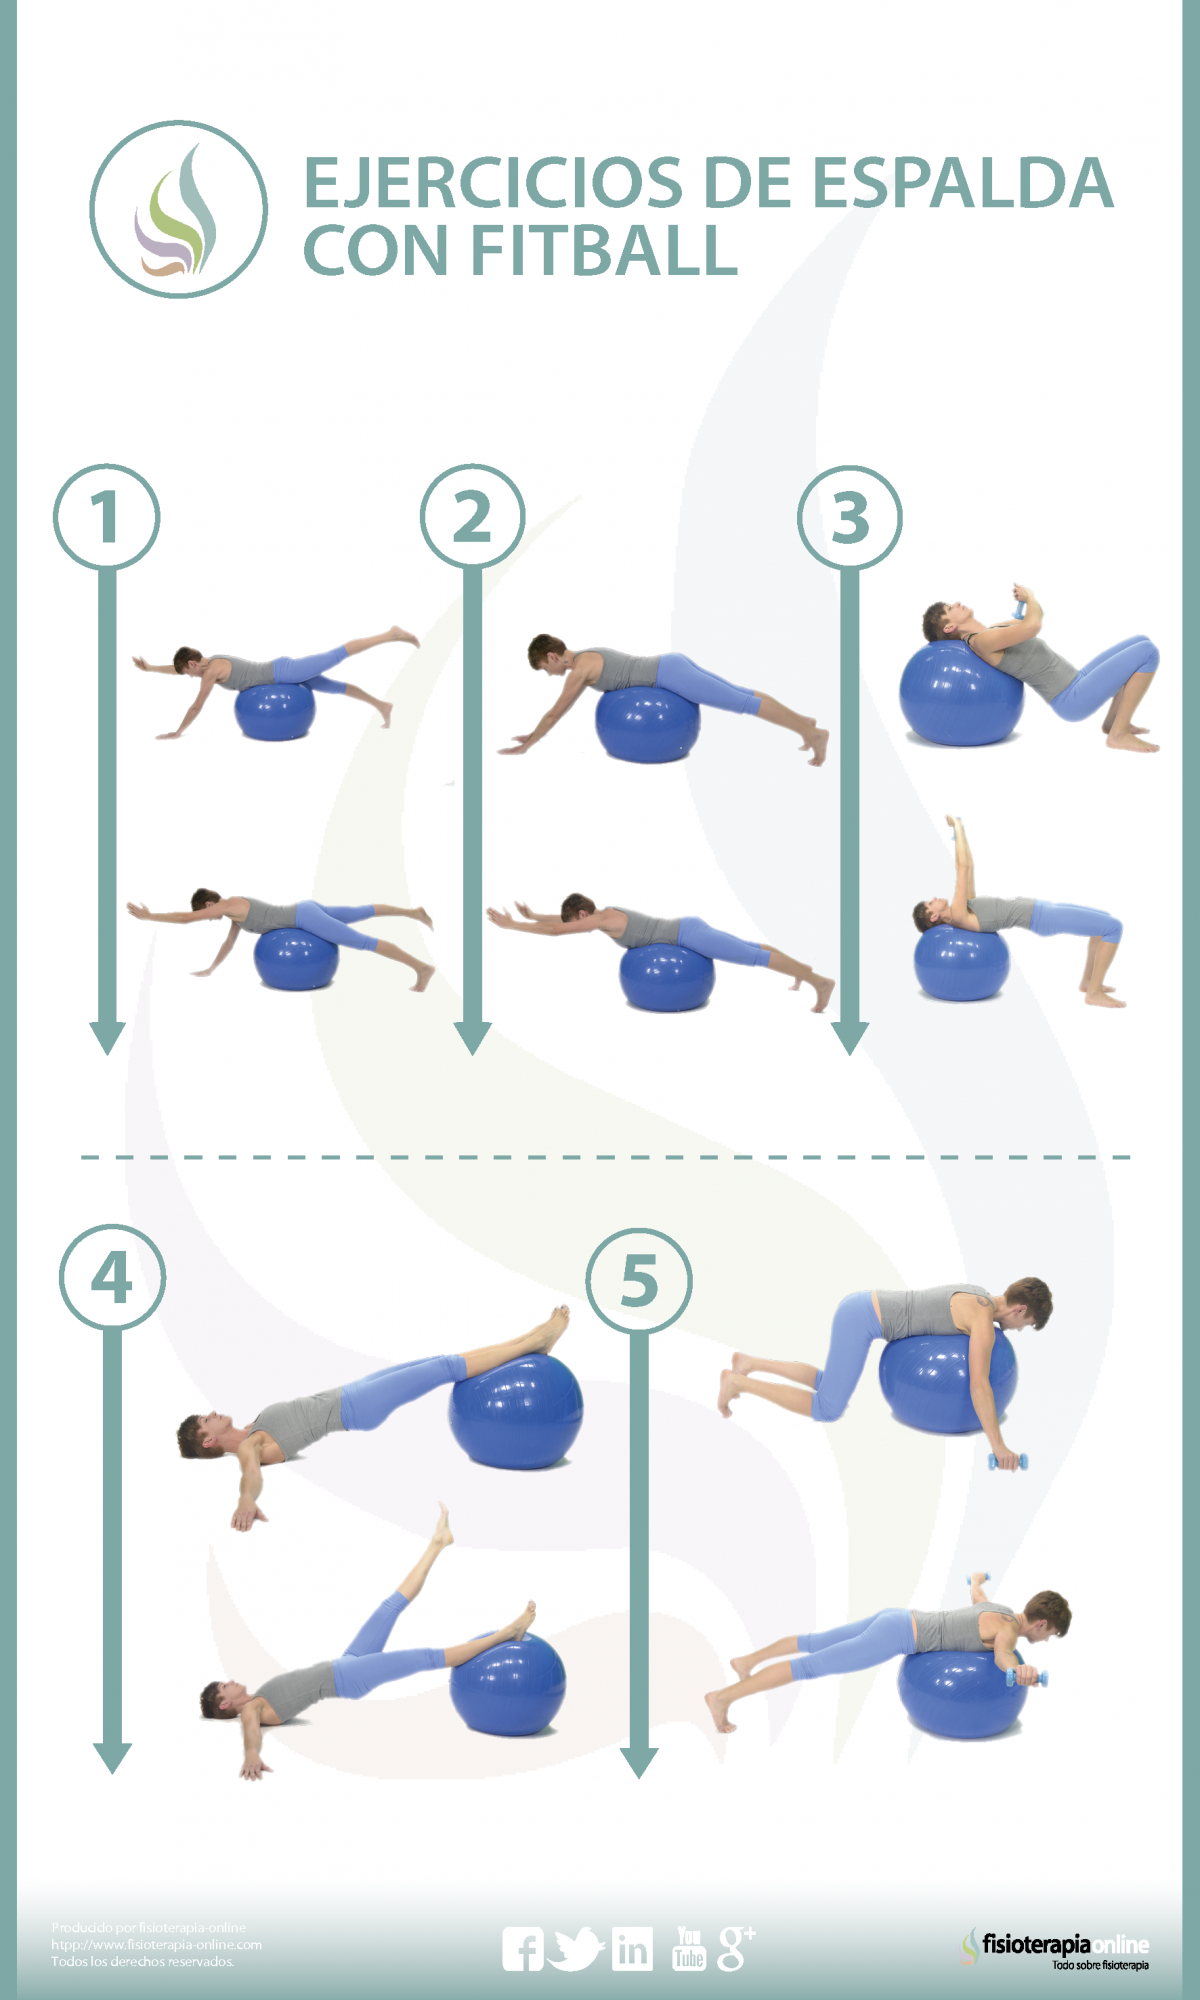 5 ejercicios para tonificar tu espalda con fitball  dfb6d5fcbf0e